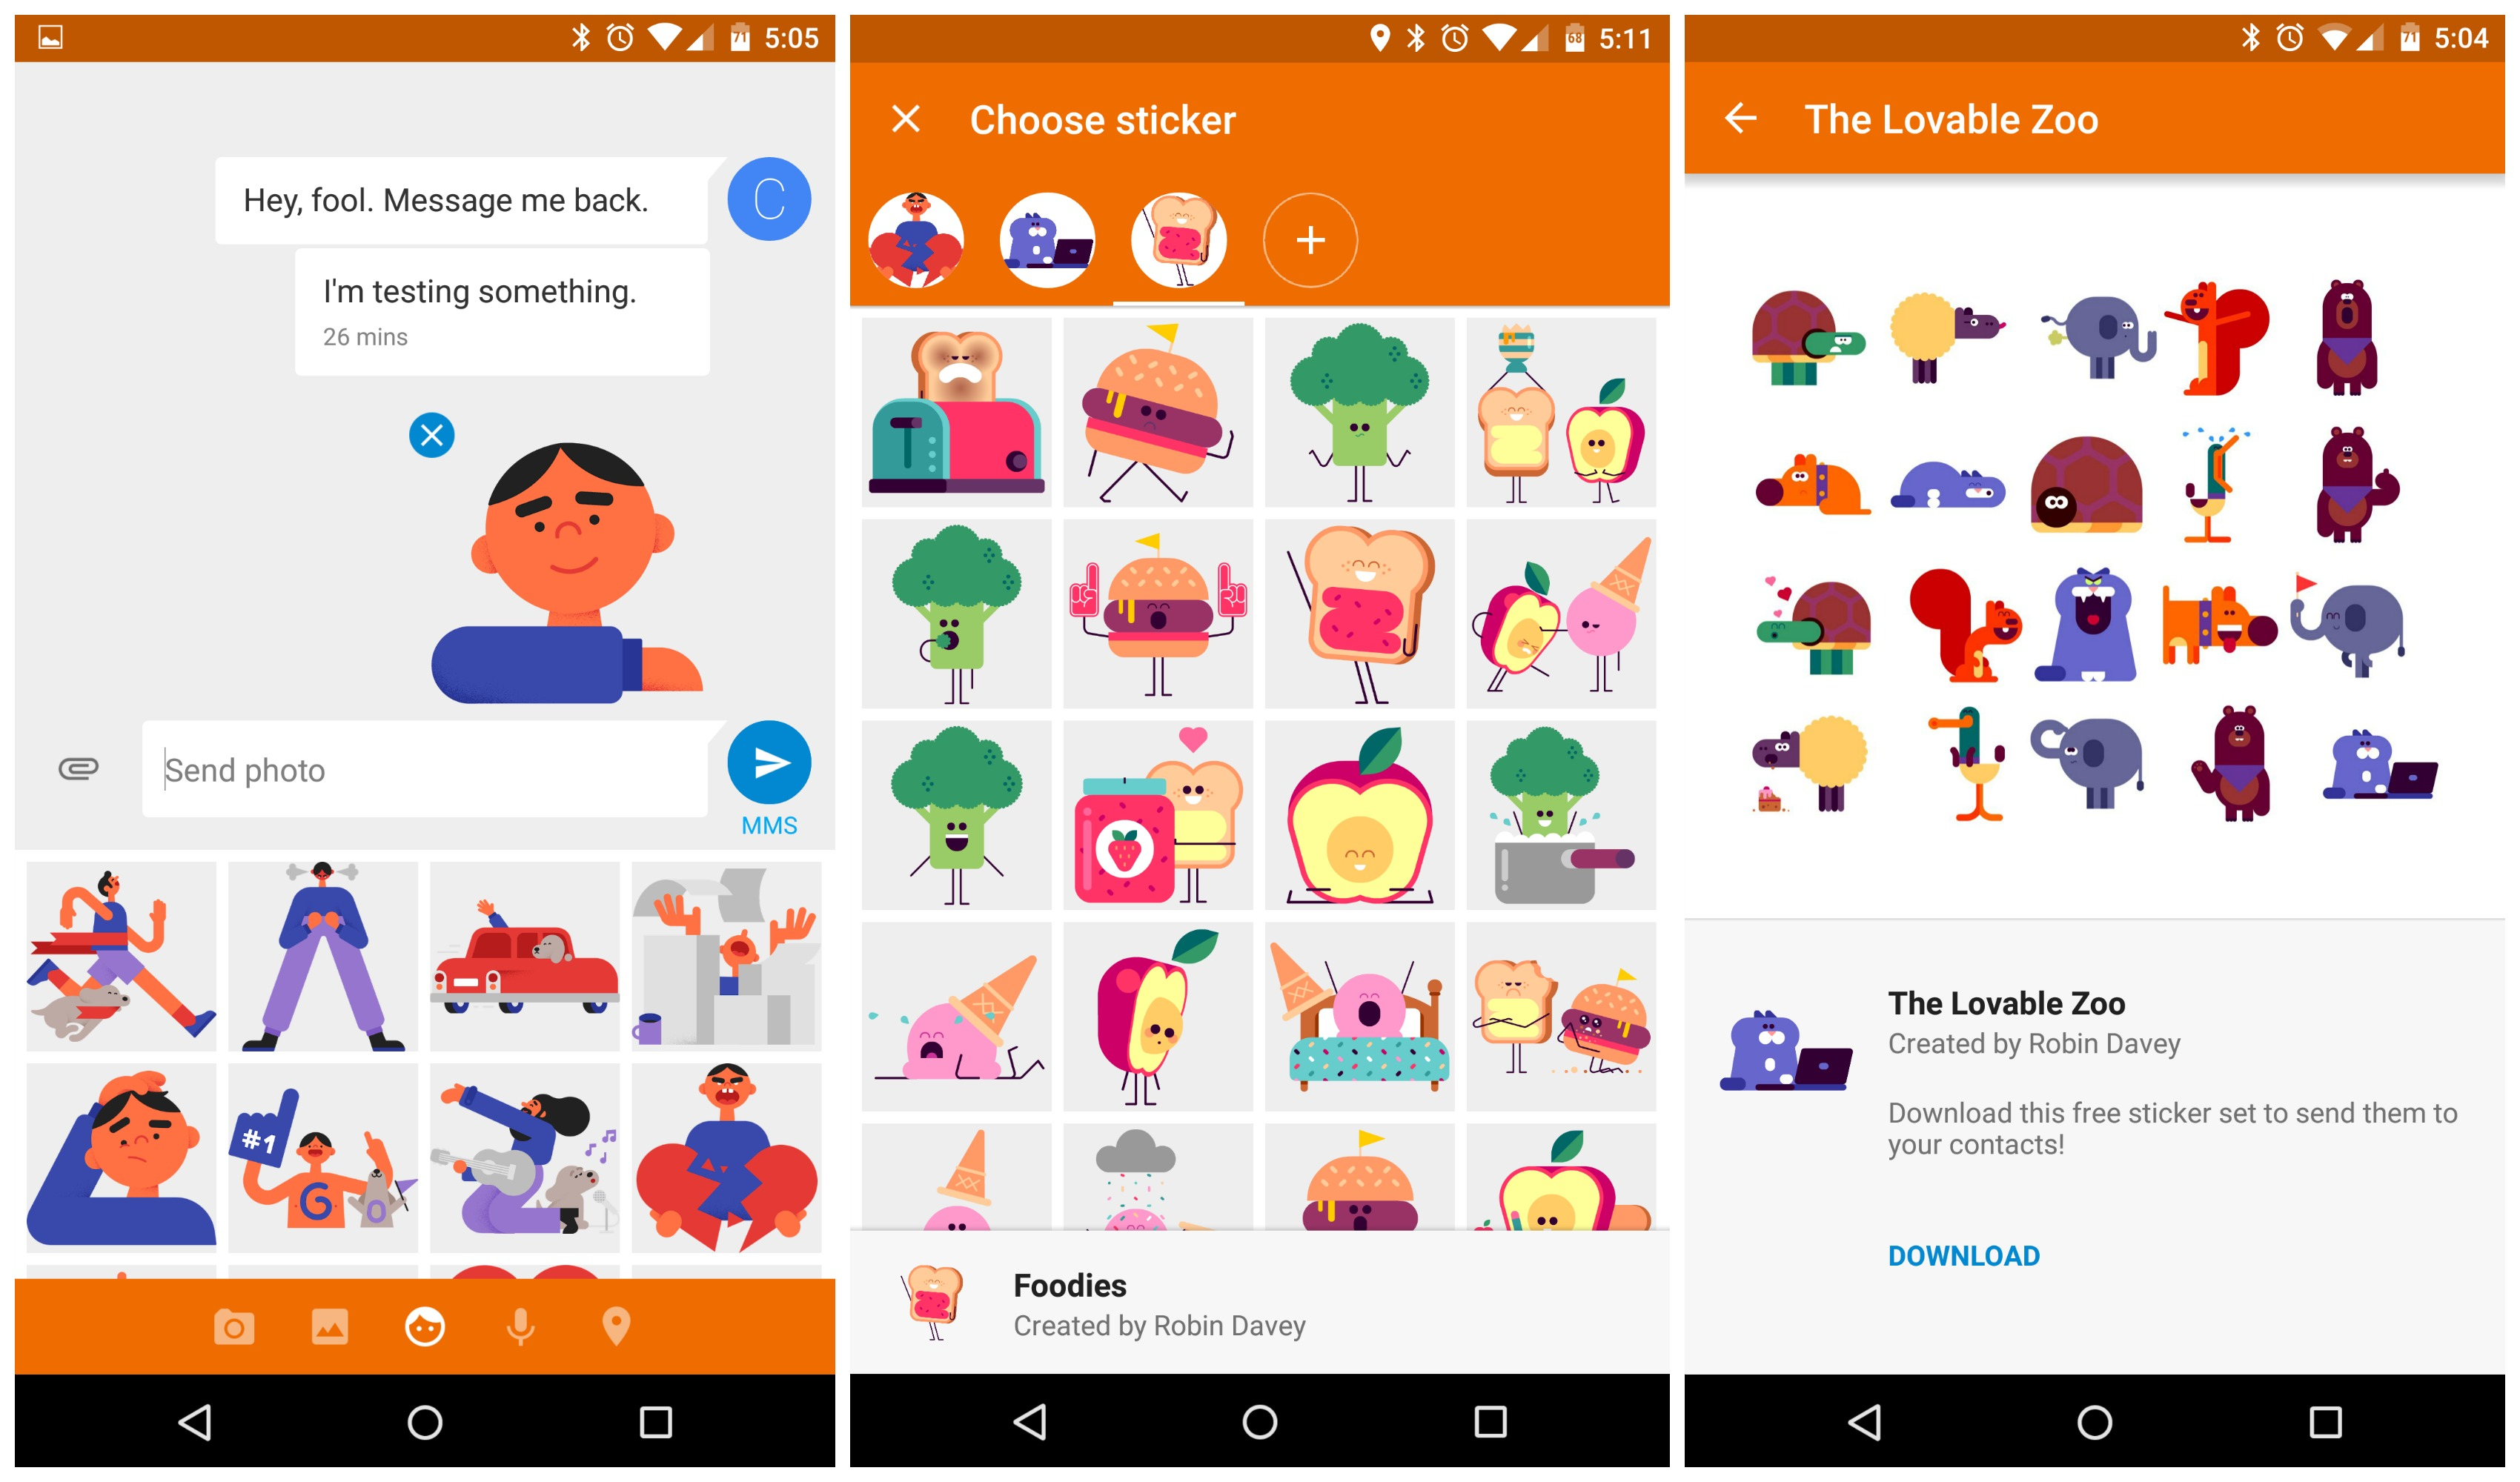 googles instant messaging review Google messenger free download - maps - navigation & transit, messenger, messenger, and many more programs.